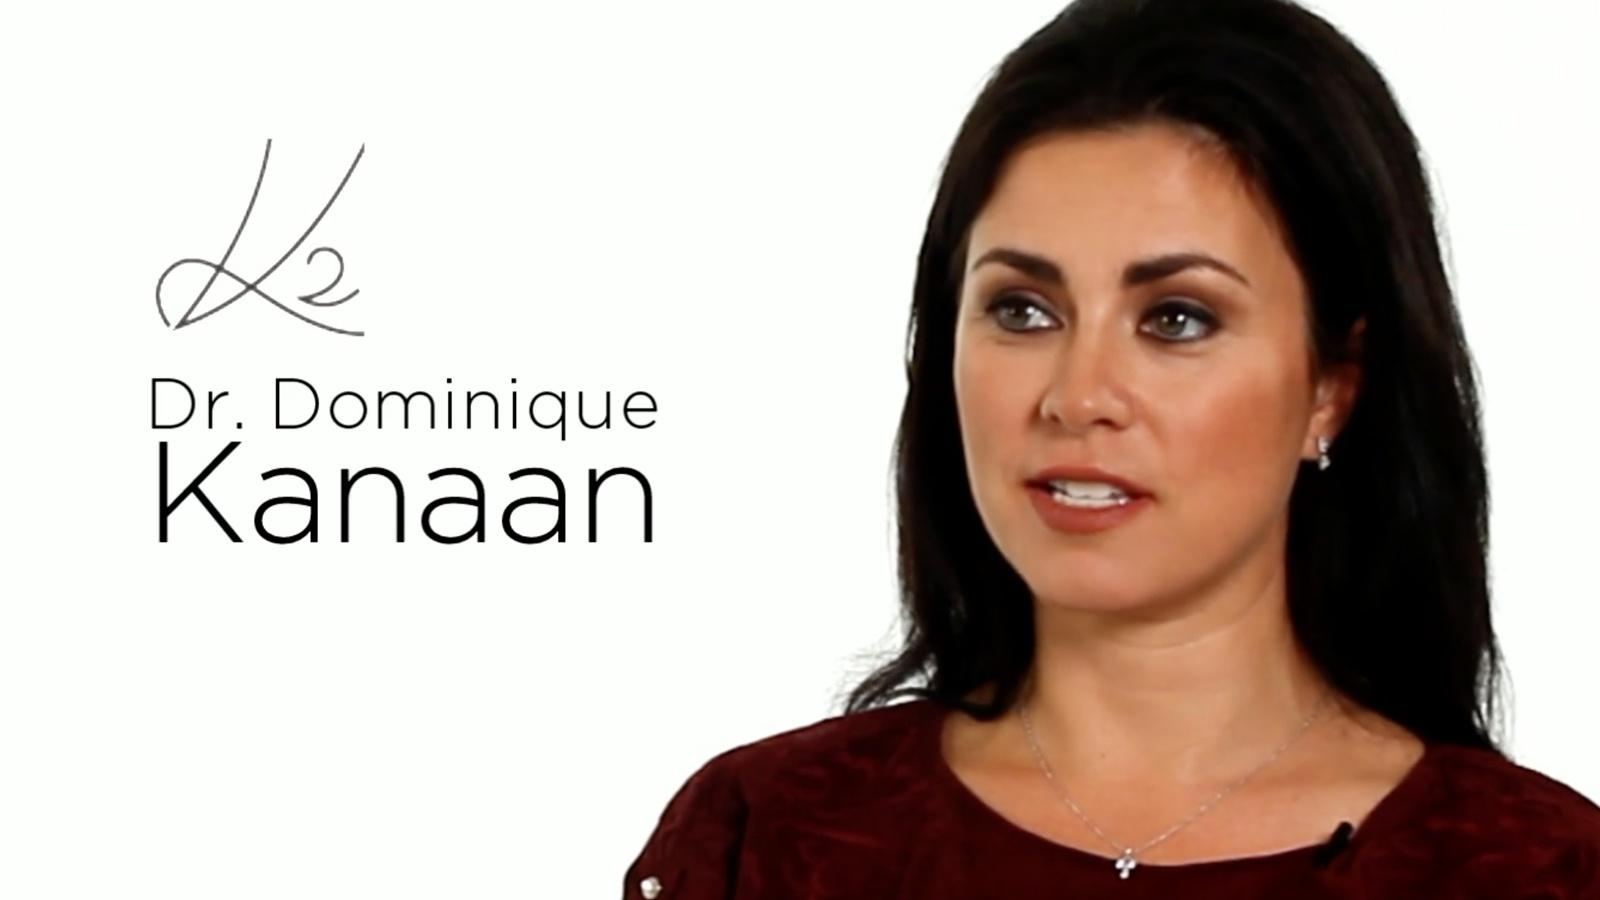 Dr. Dominique Kanaan